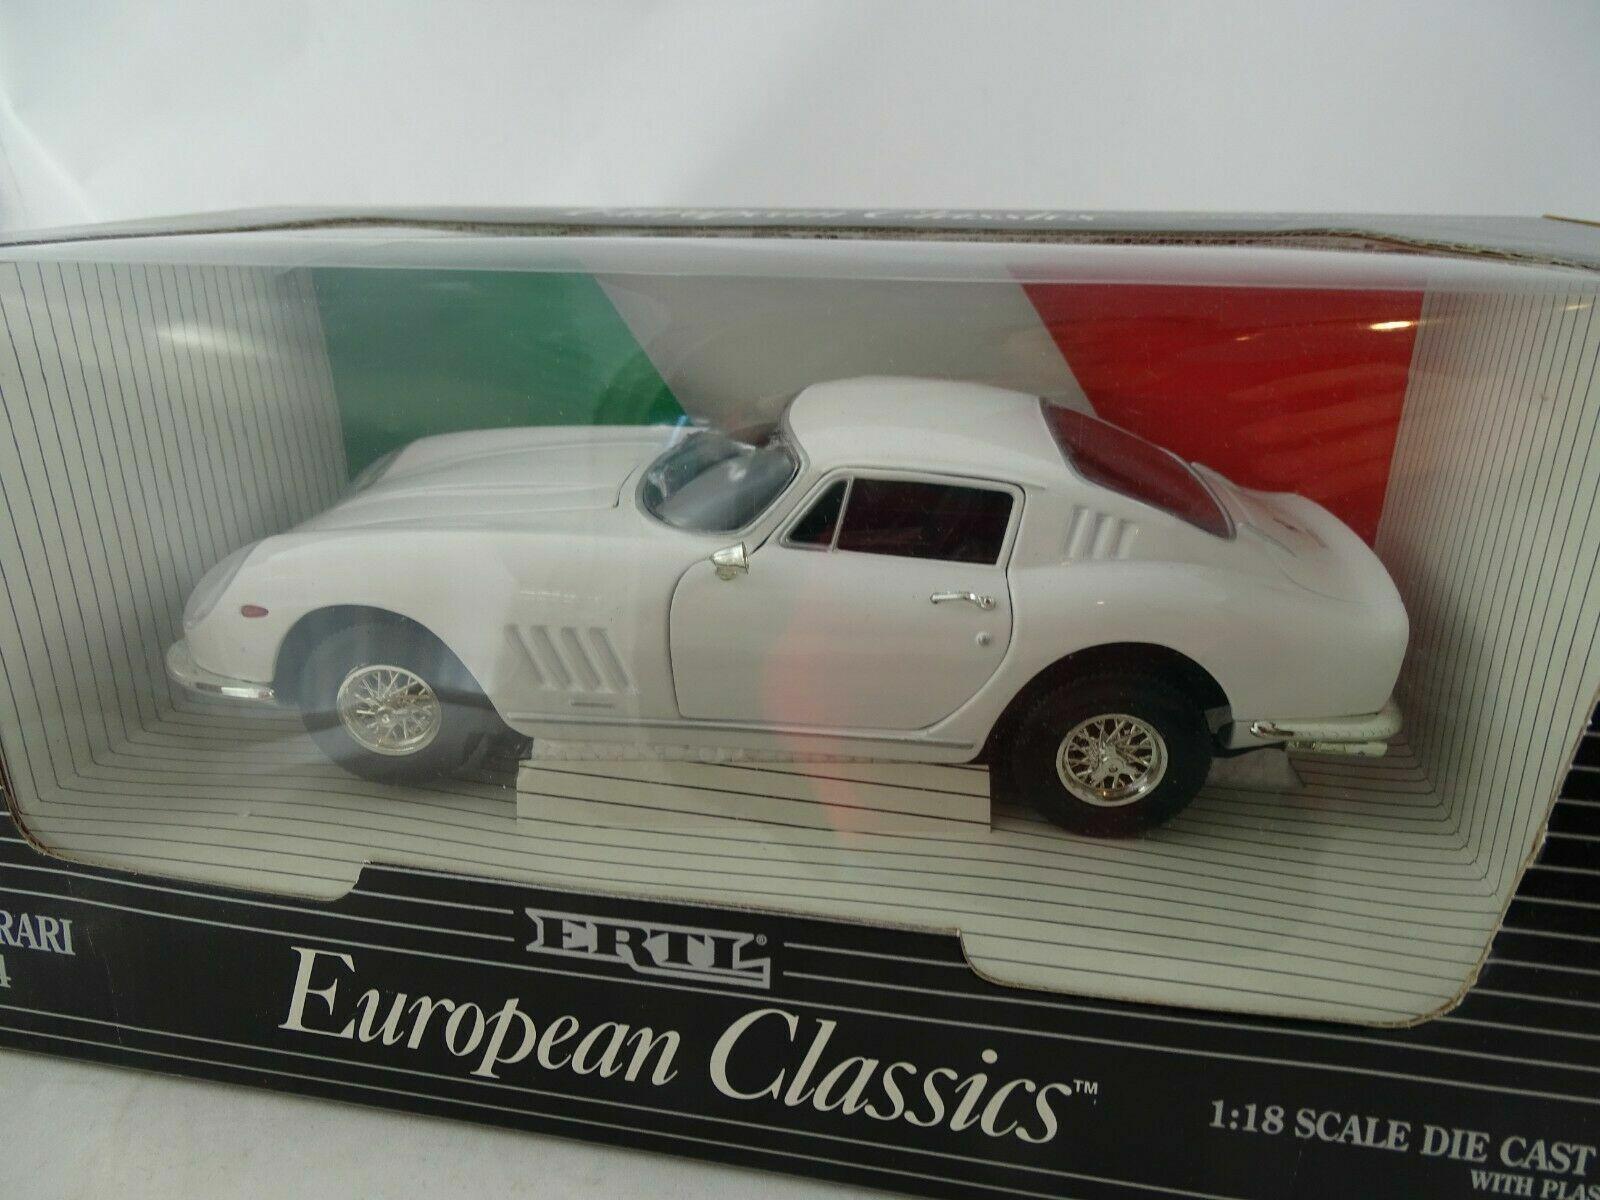 1 18 ertl European Classics 1966 ferrari 275 GTB 4 blancoo  07493 como nuevo